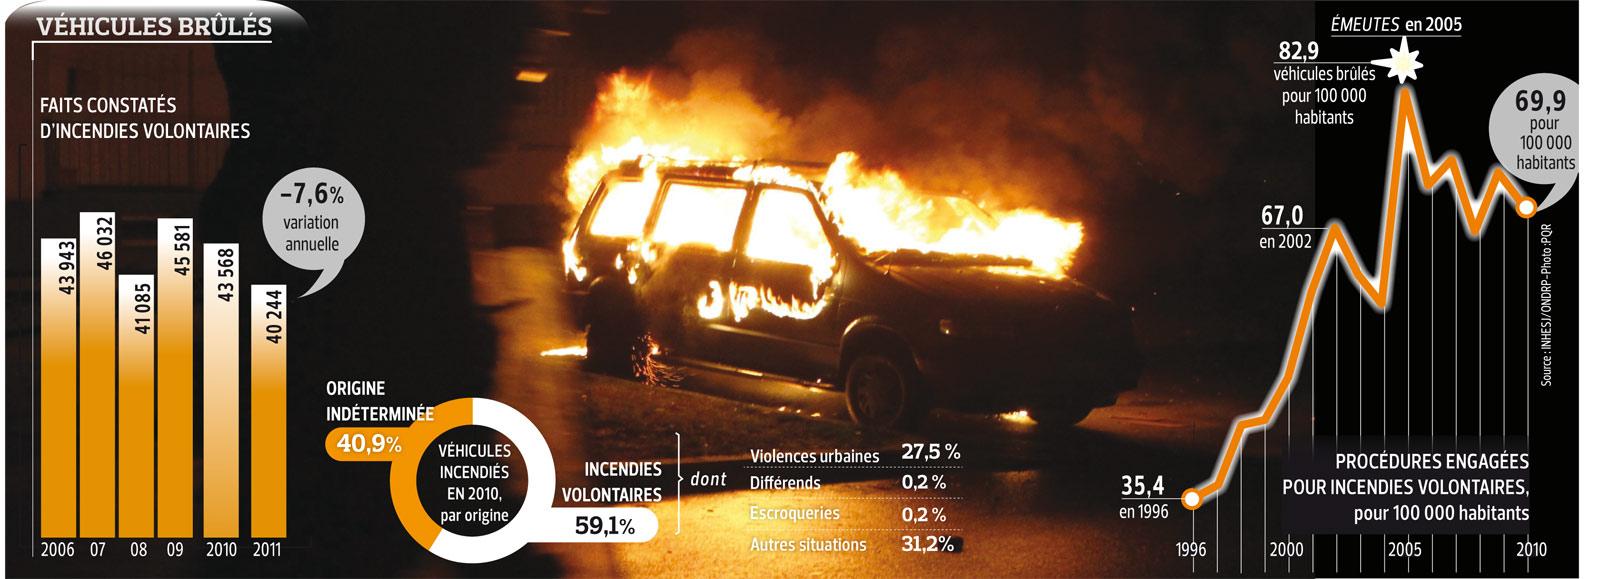 SOC201253-voitures-brulees